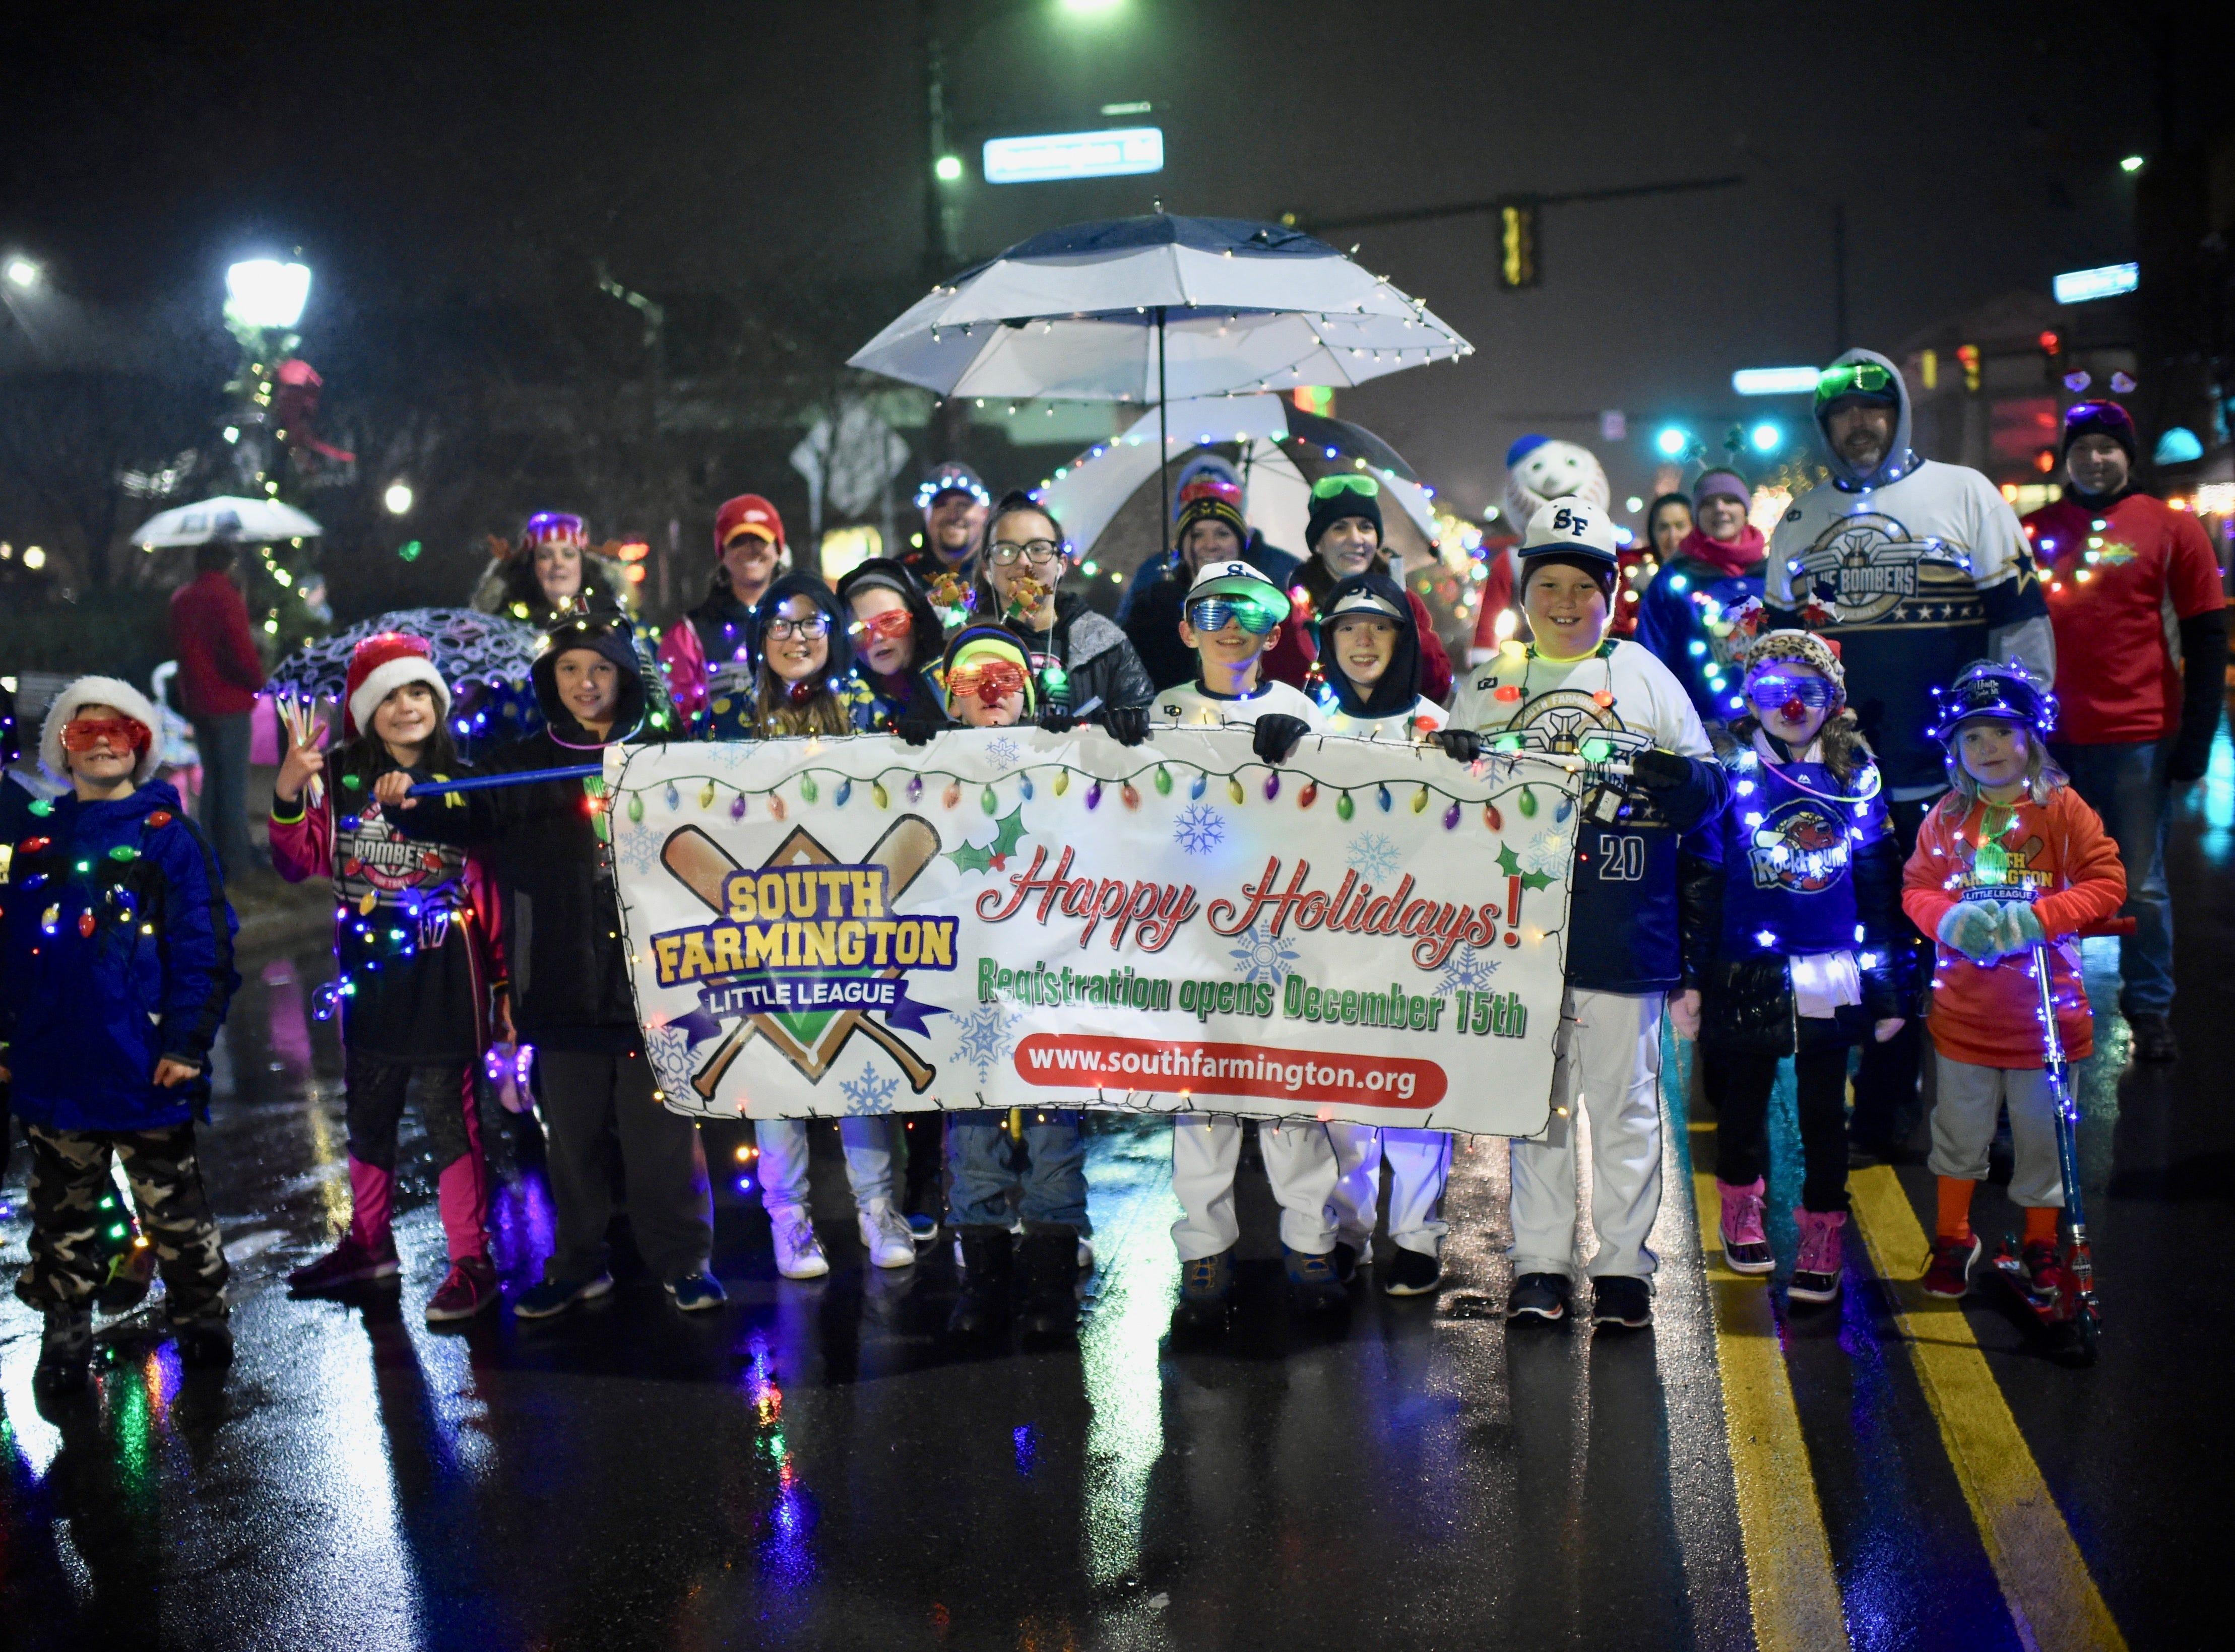 South Farmington Little League members take part in this year's parade in Farmington.